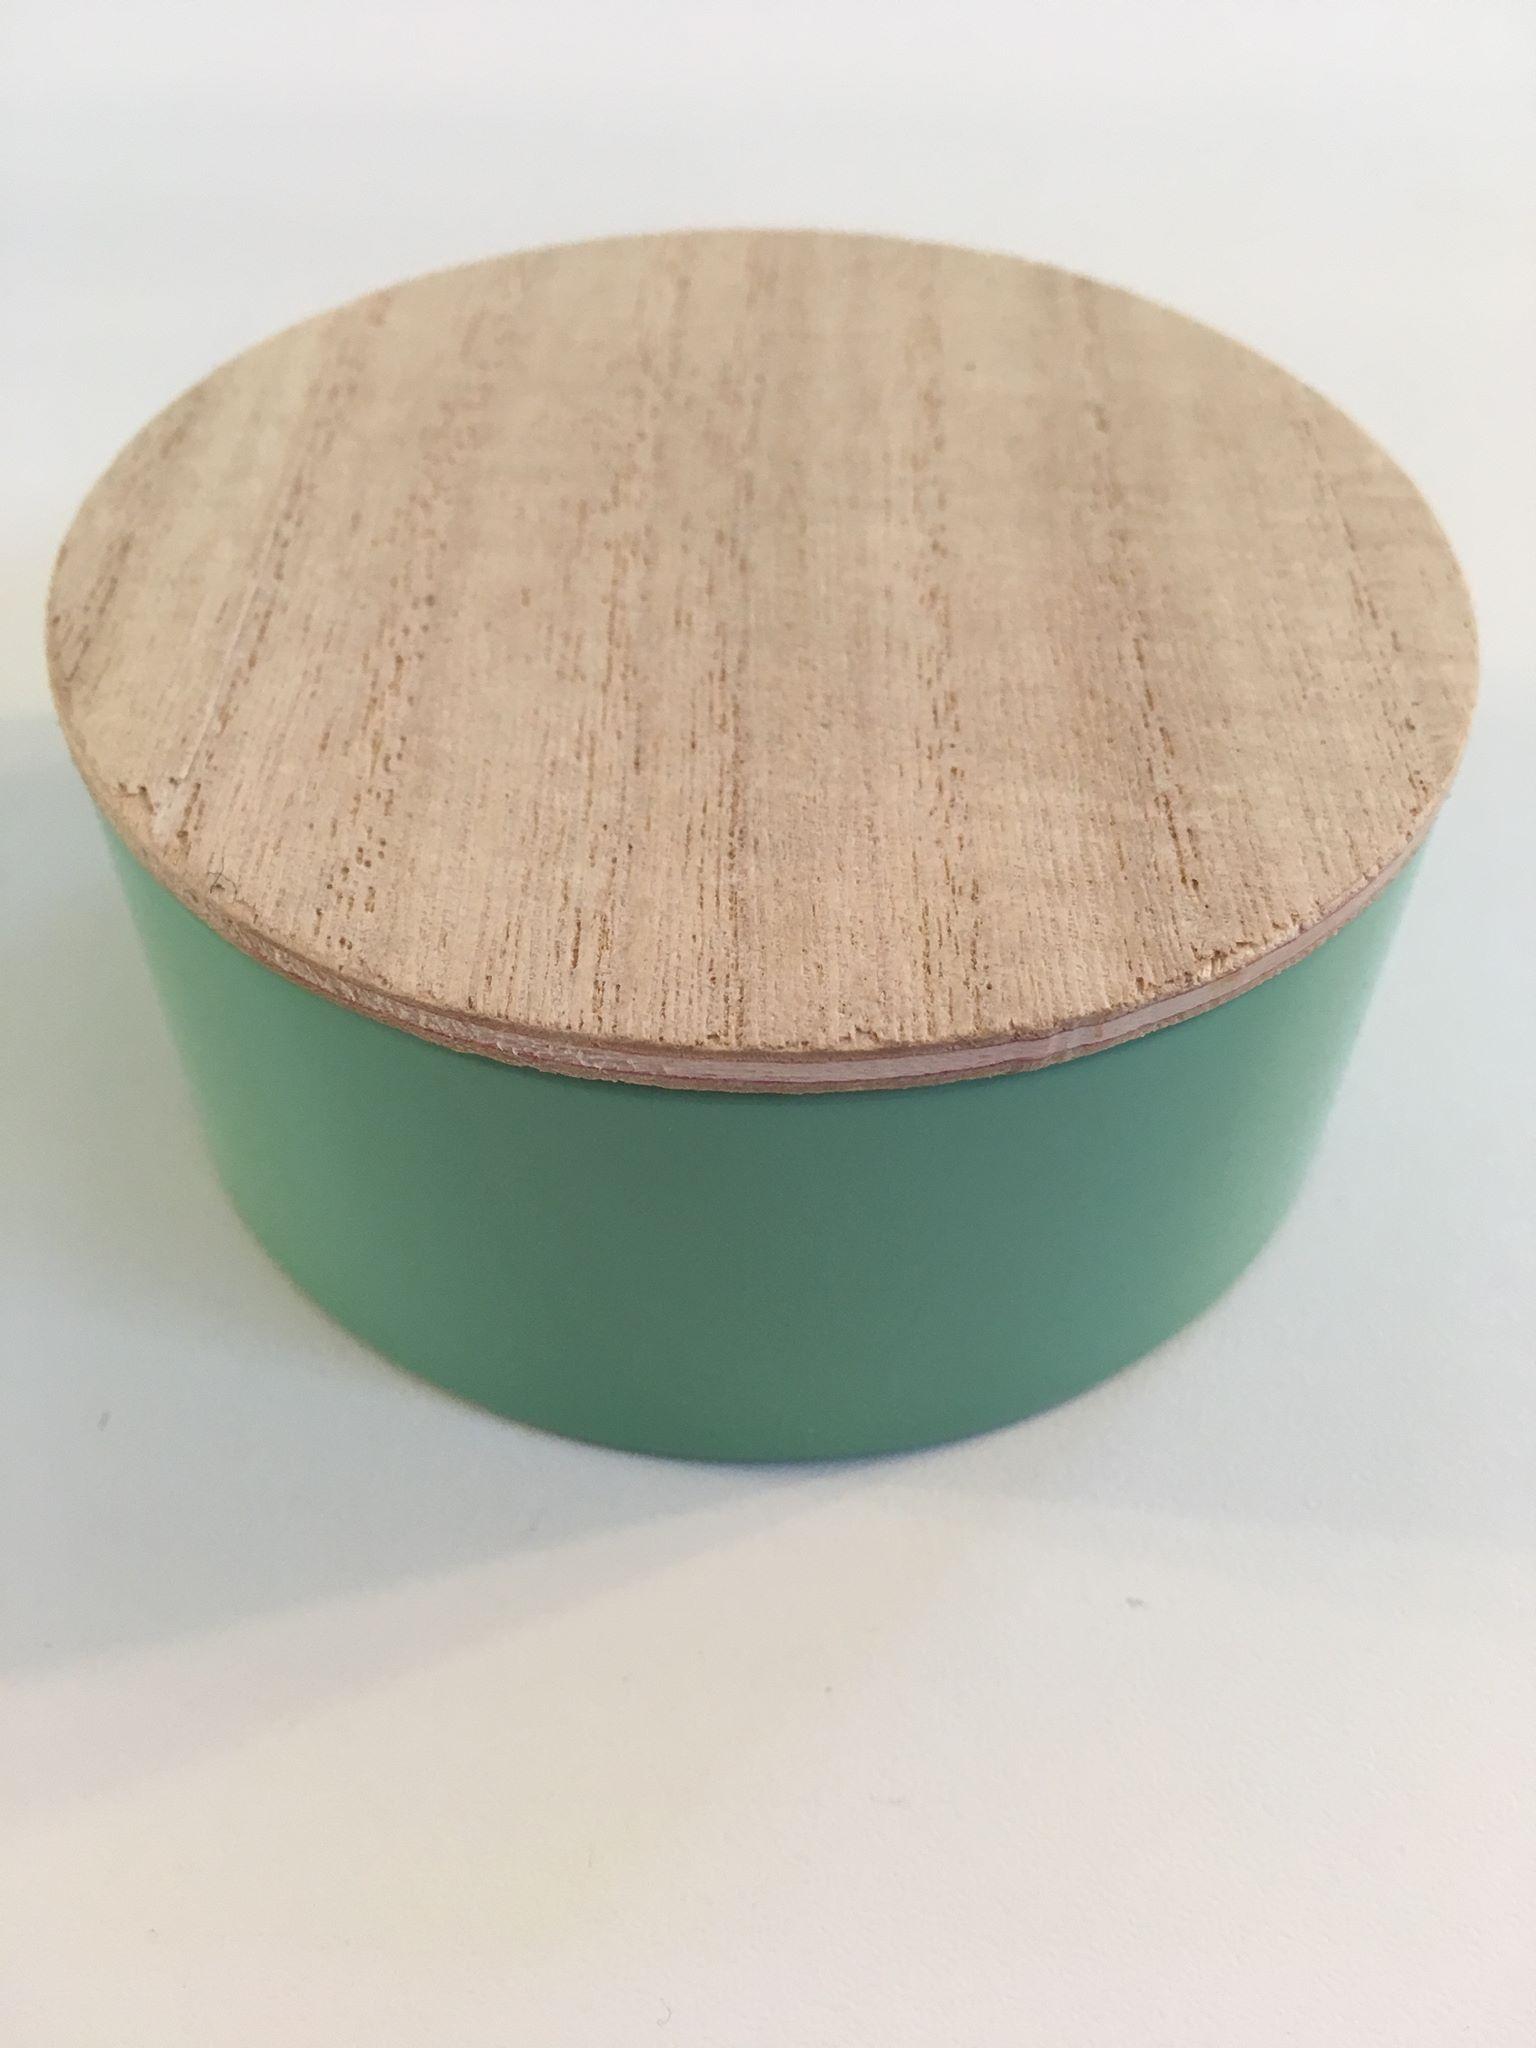 Blikken potje muntgroen met houten deksel